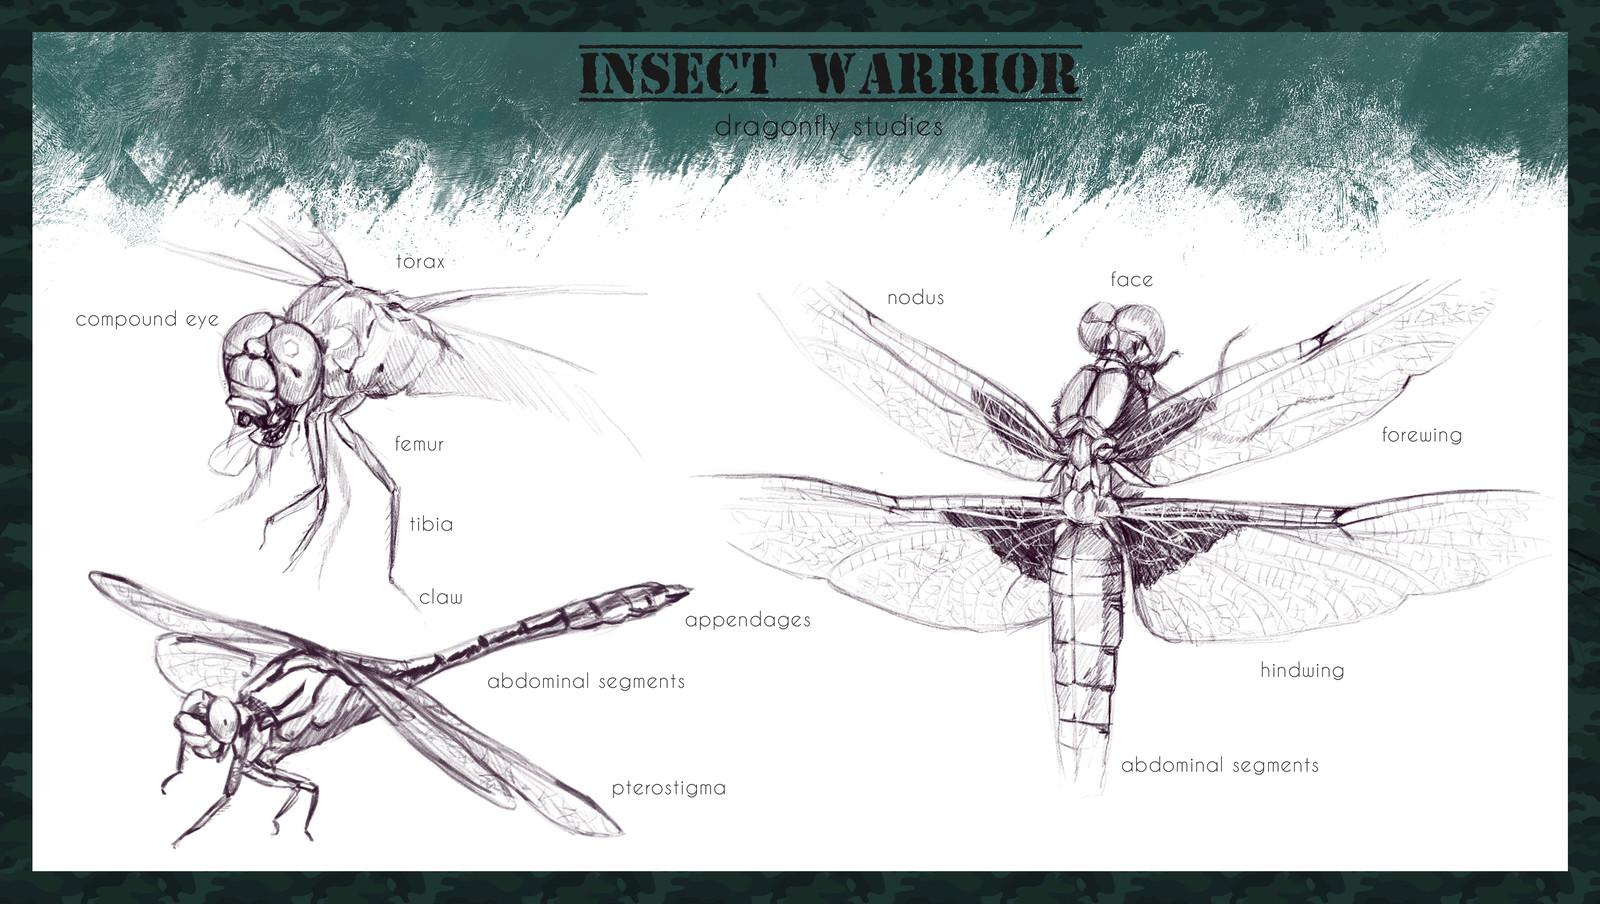 Dragonfly studies